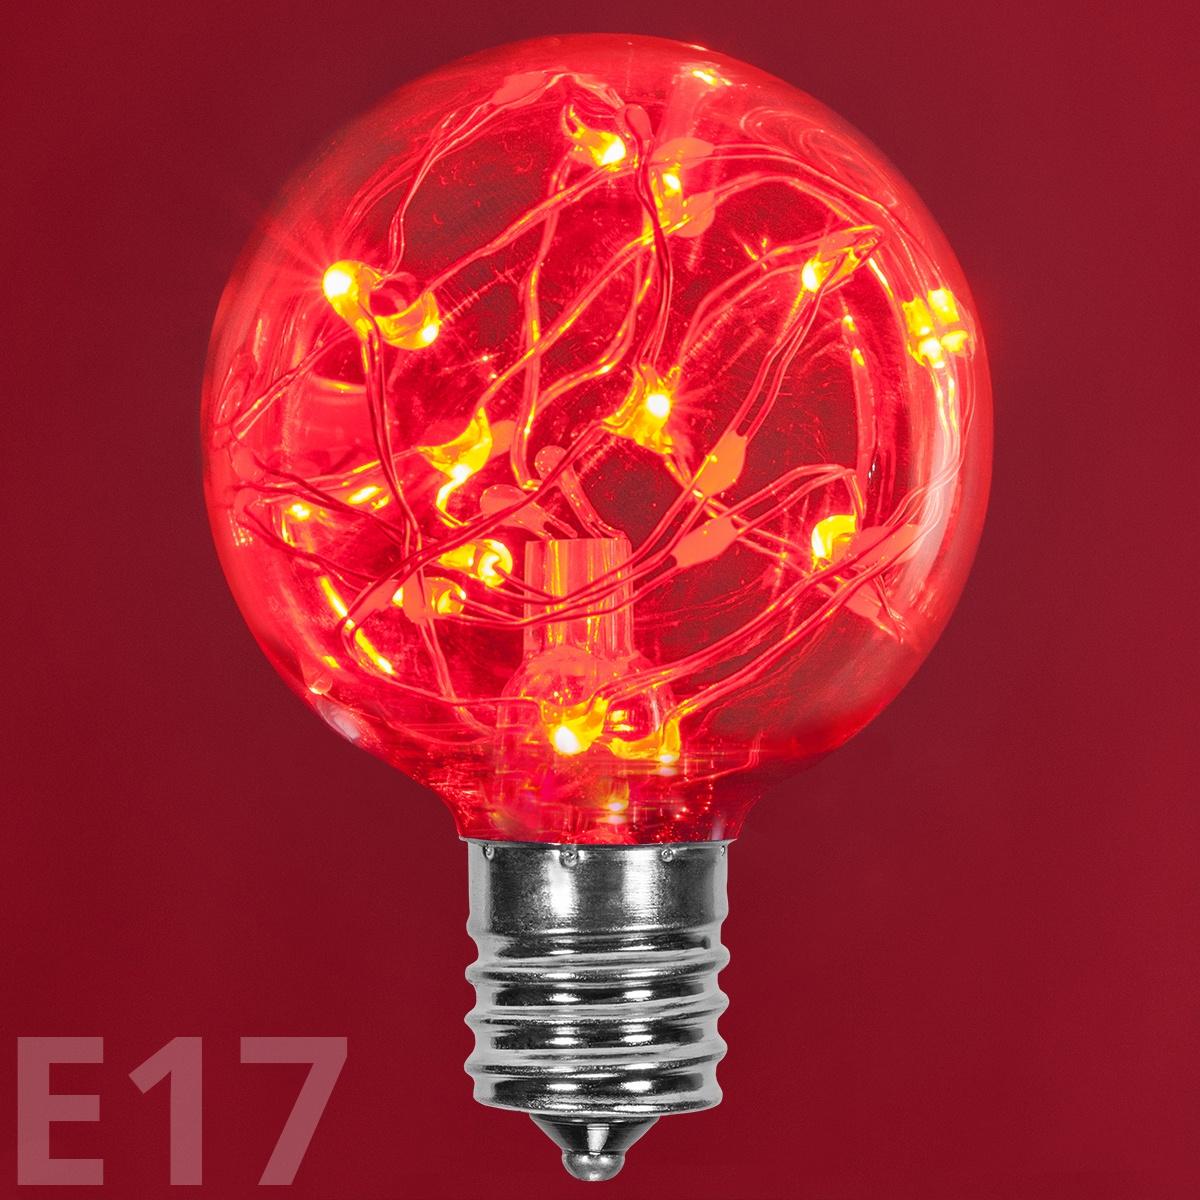 Red And White Bulb Christmas Lights